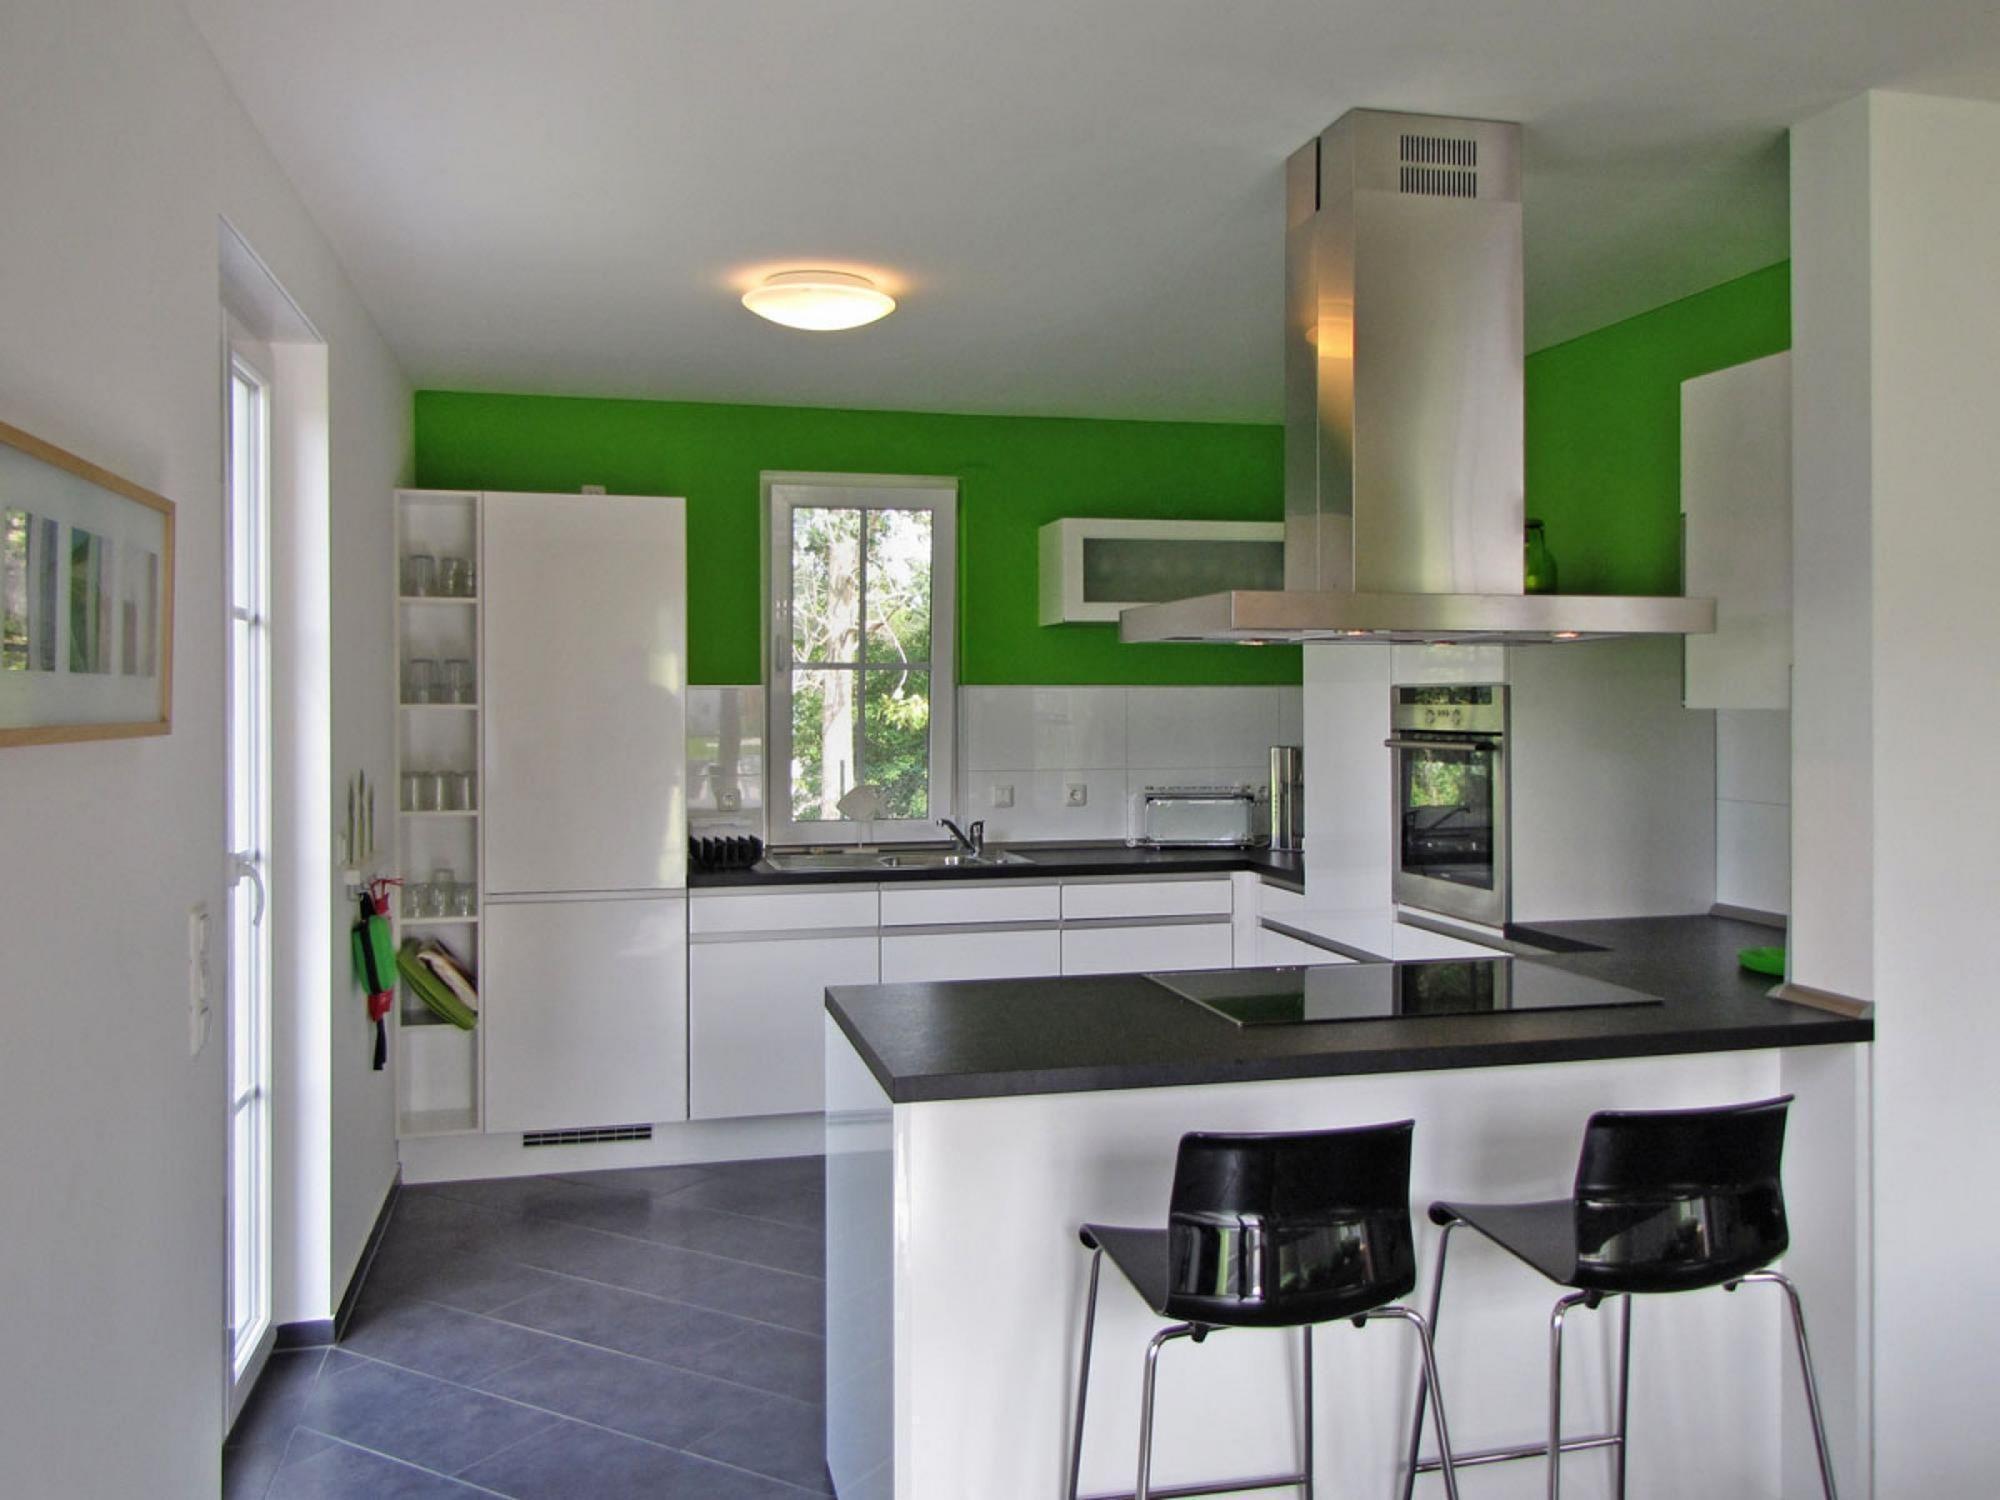 9 Wonderful Open Kitchen Design Ideas To Display A More Elegant ...